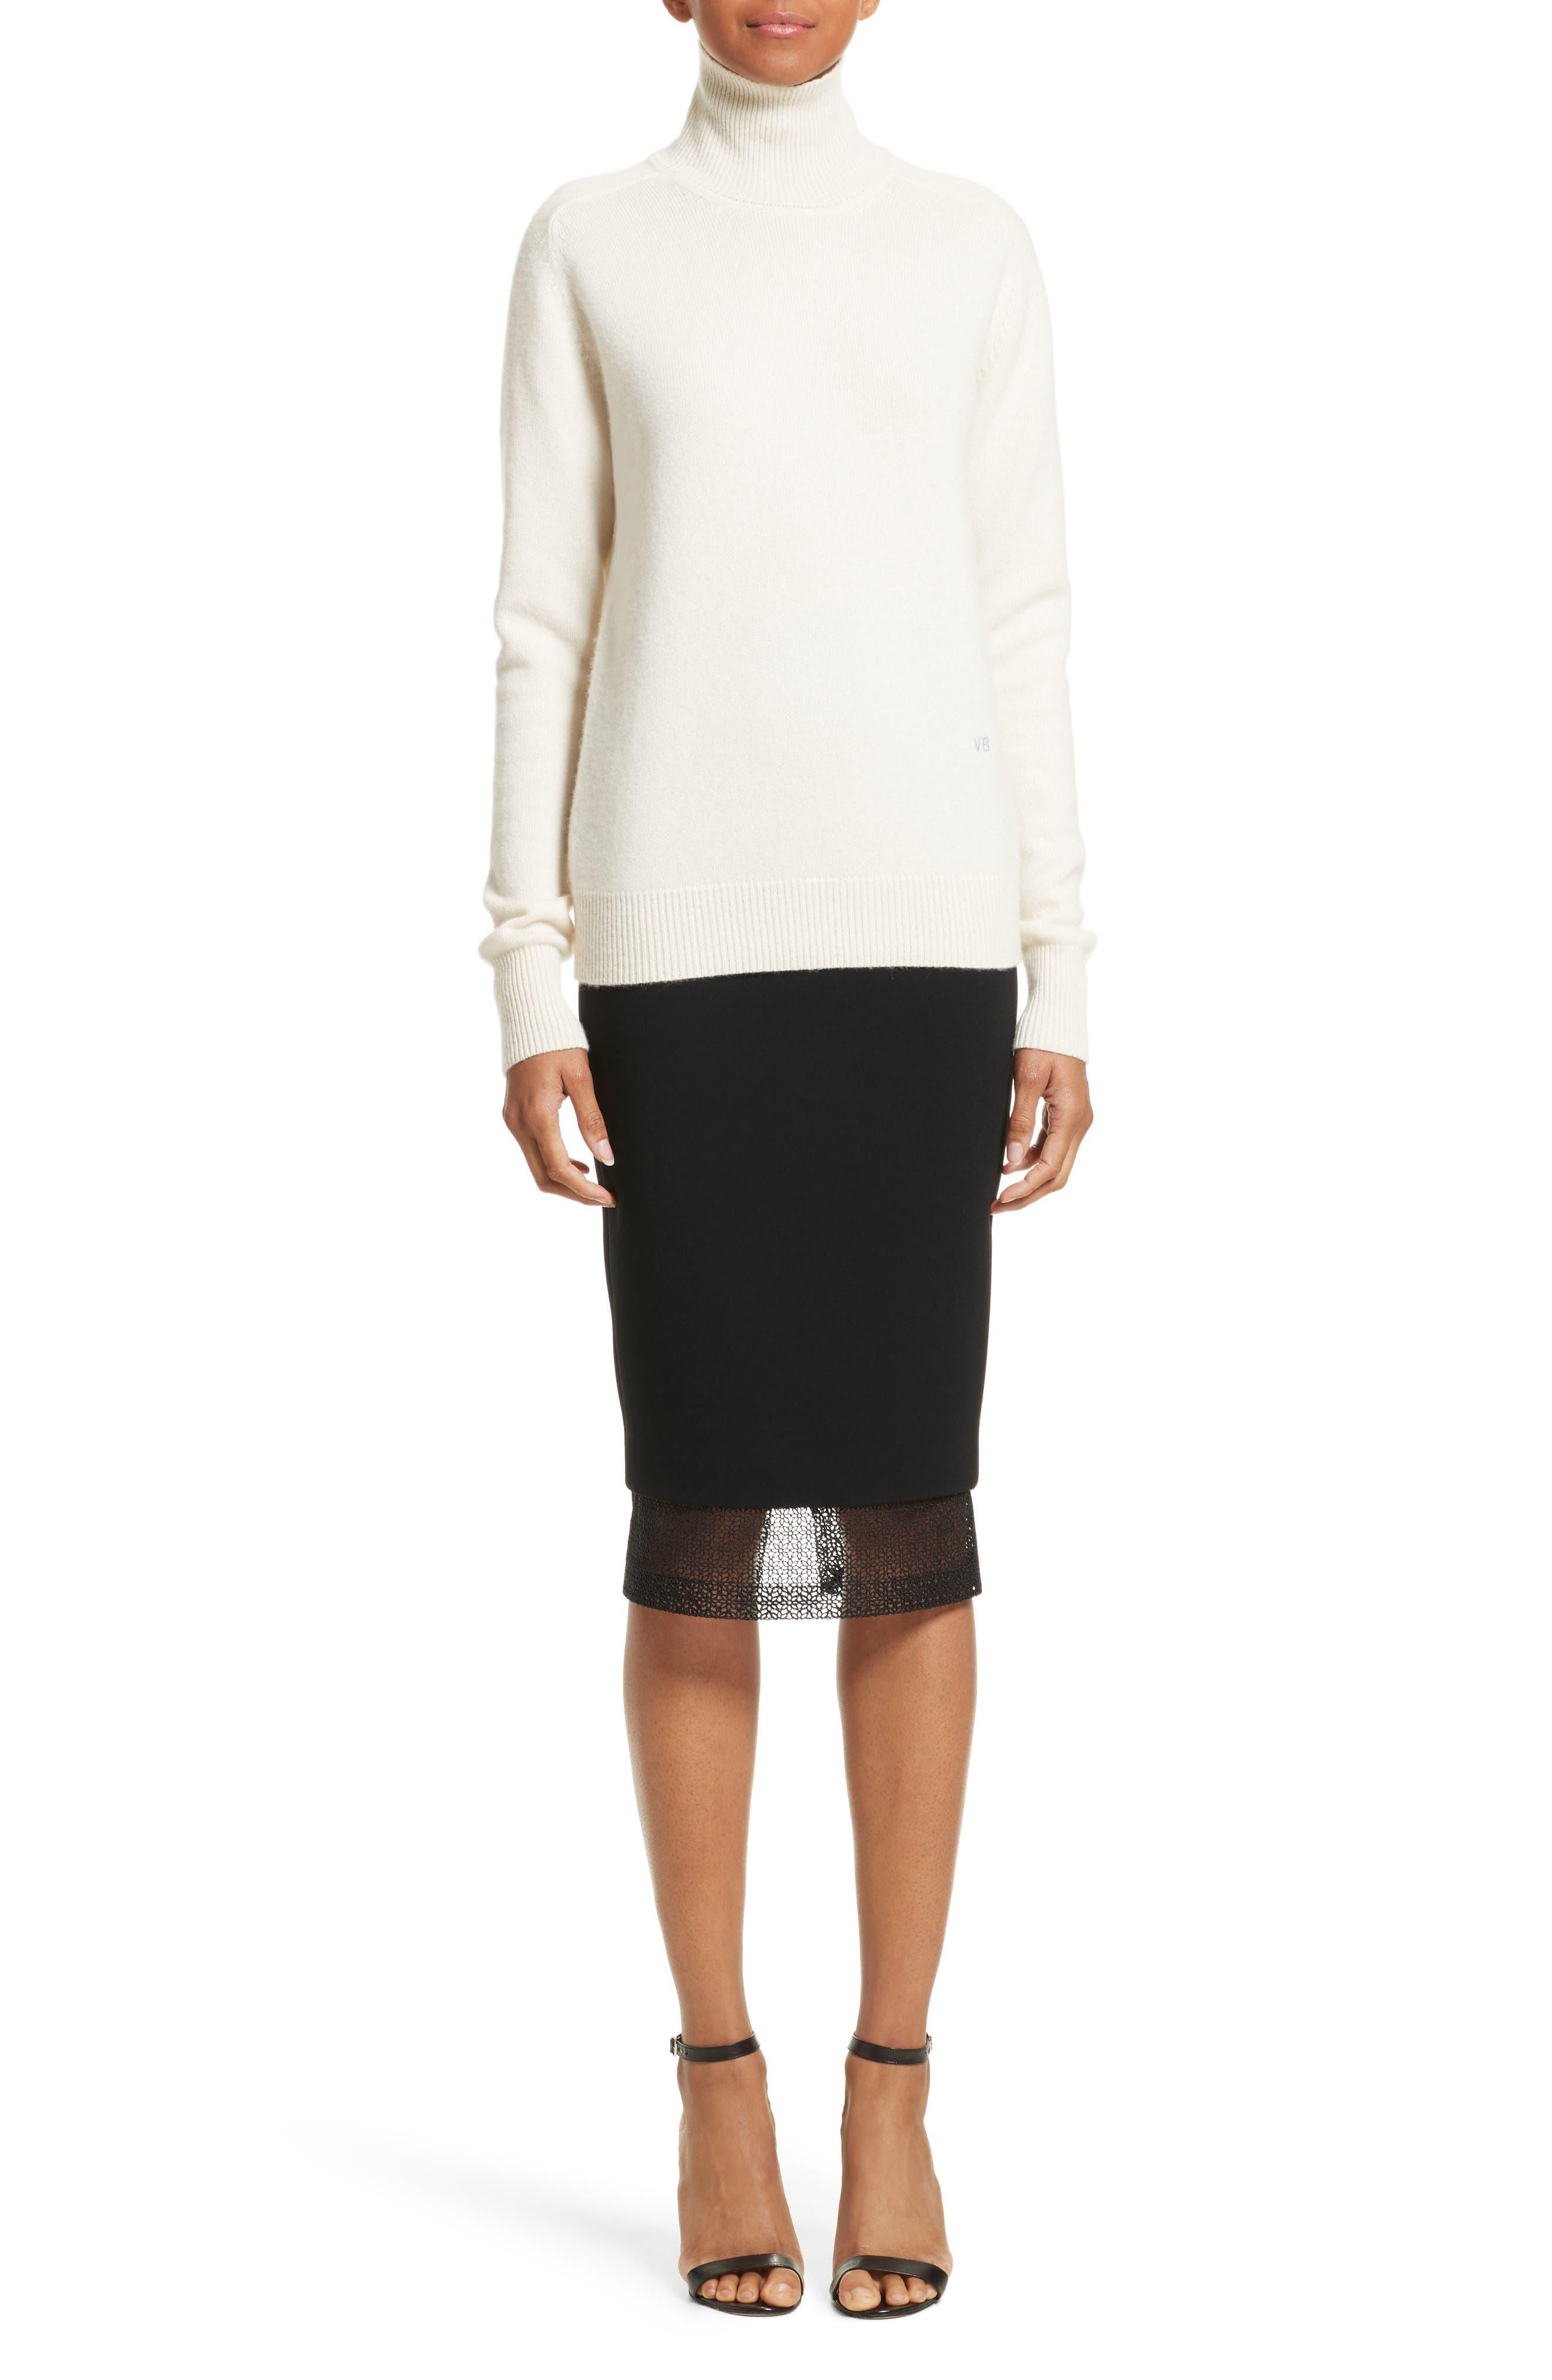 VICTORIA BECKHAM, Cashmere Turtleneck Sweater, Alternate thumbnail 6, color, VANILLA